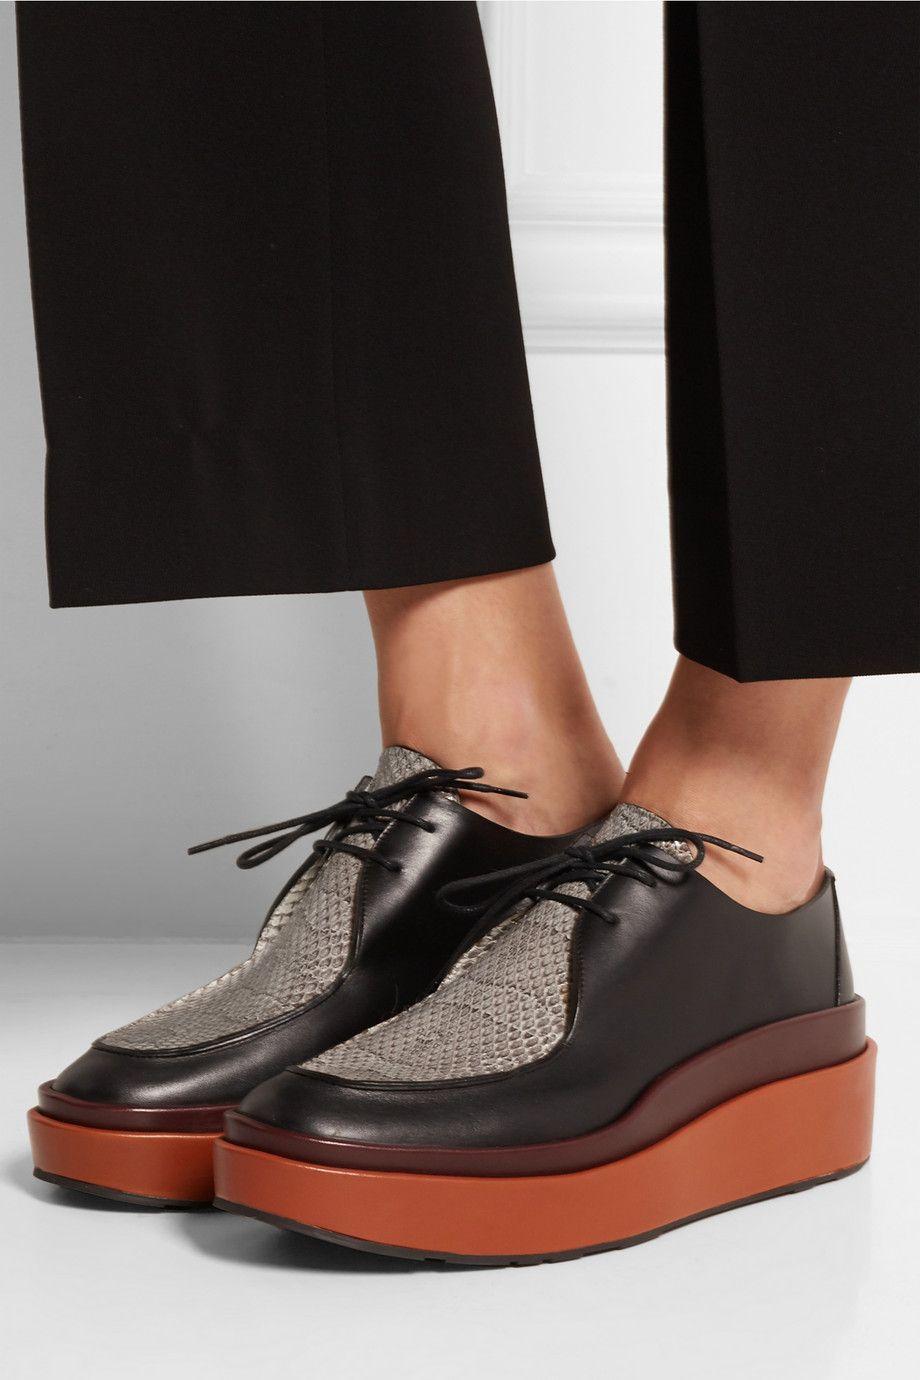 Chaussures Derby Plateforme Printemps / Été Jil Sander YC0iAc7hv0